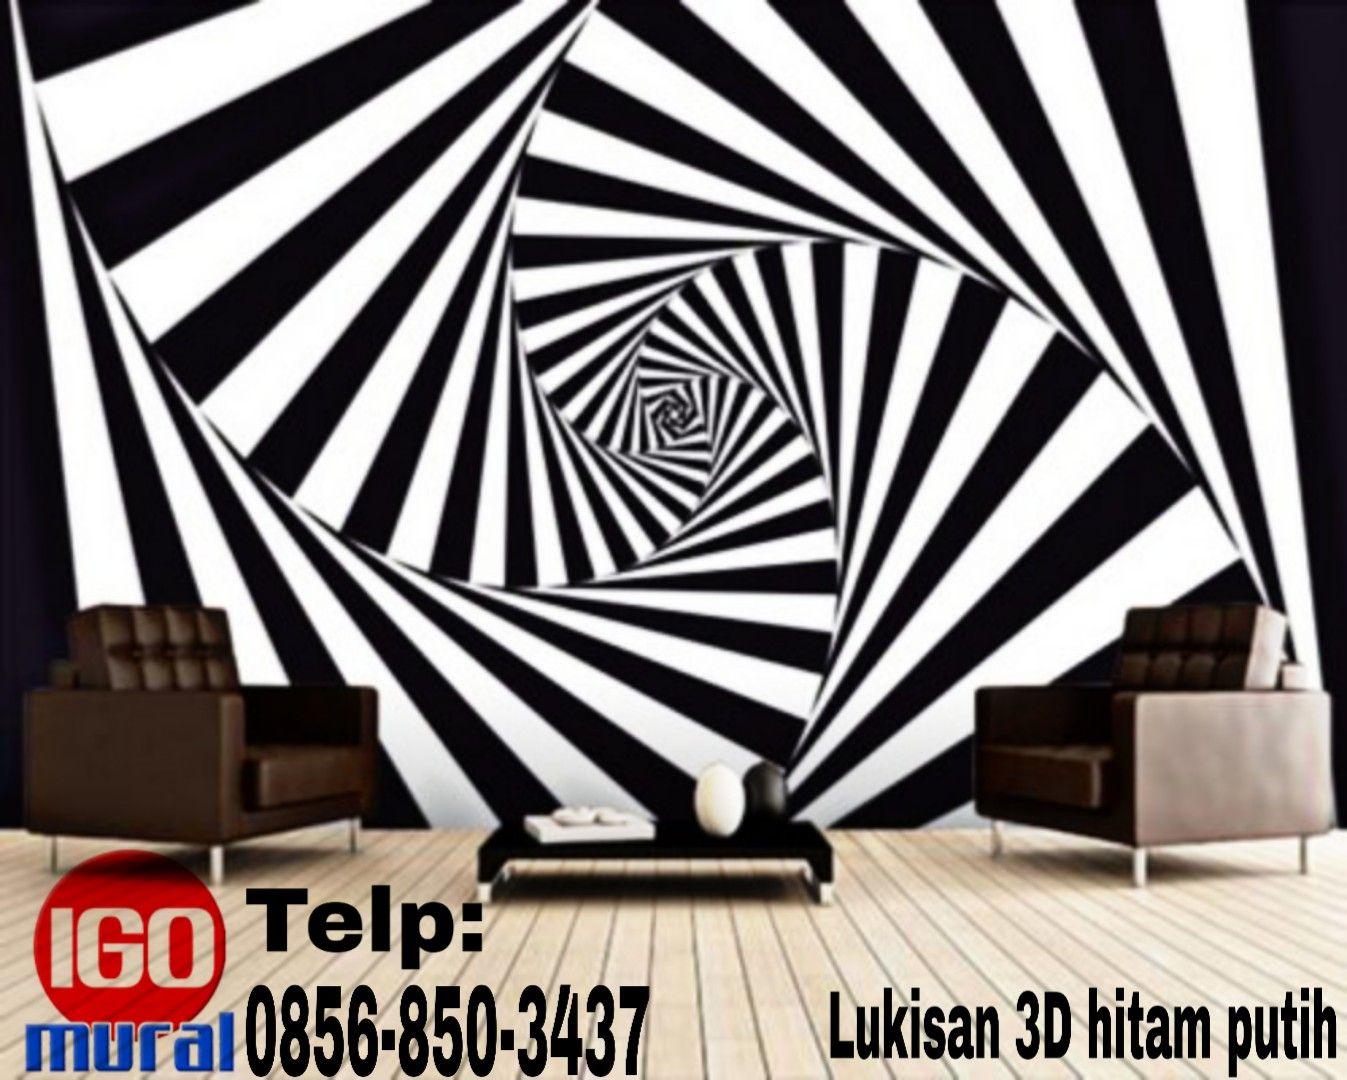 0856 850 3437 Jasa Lukisan 3d Hitam Putih Lukisan3ddindingsederhana Di Pinterest